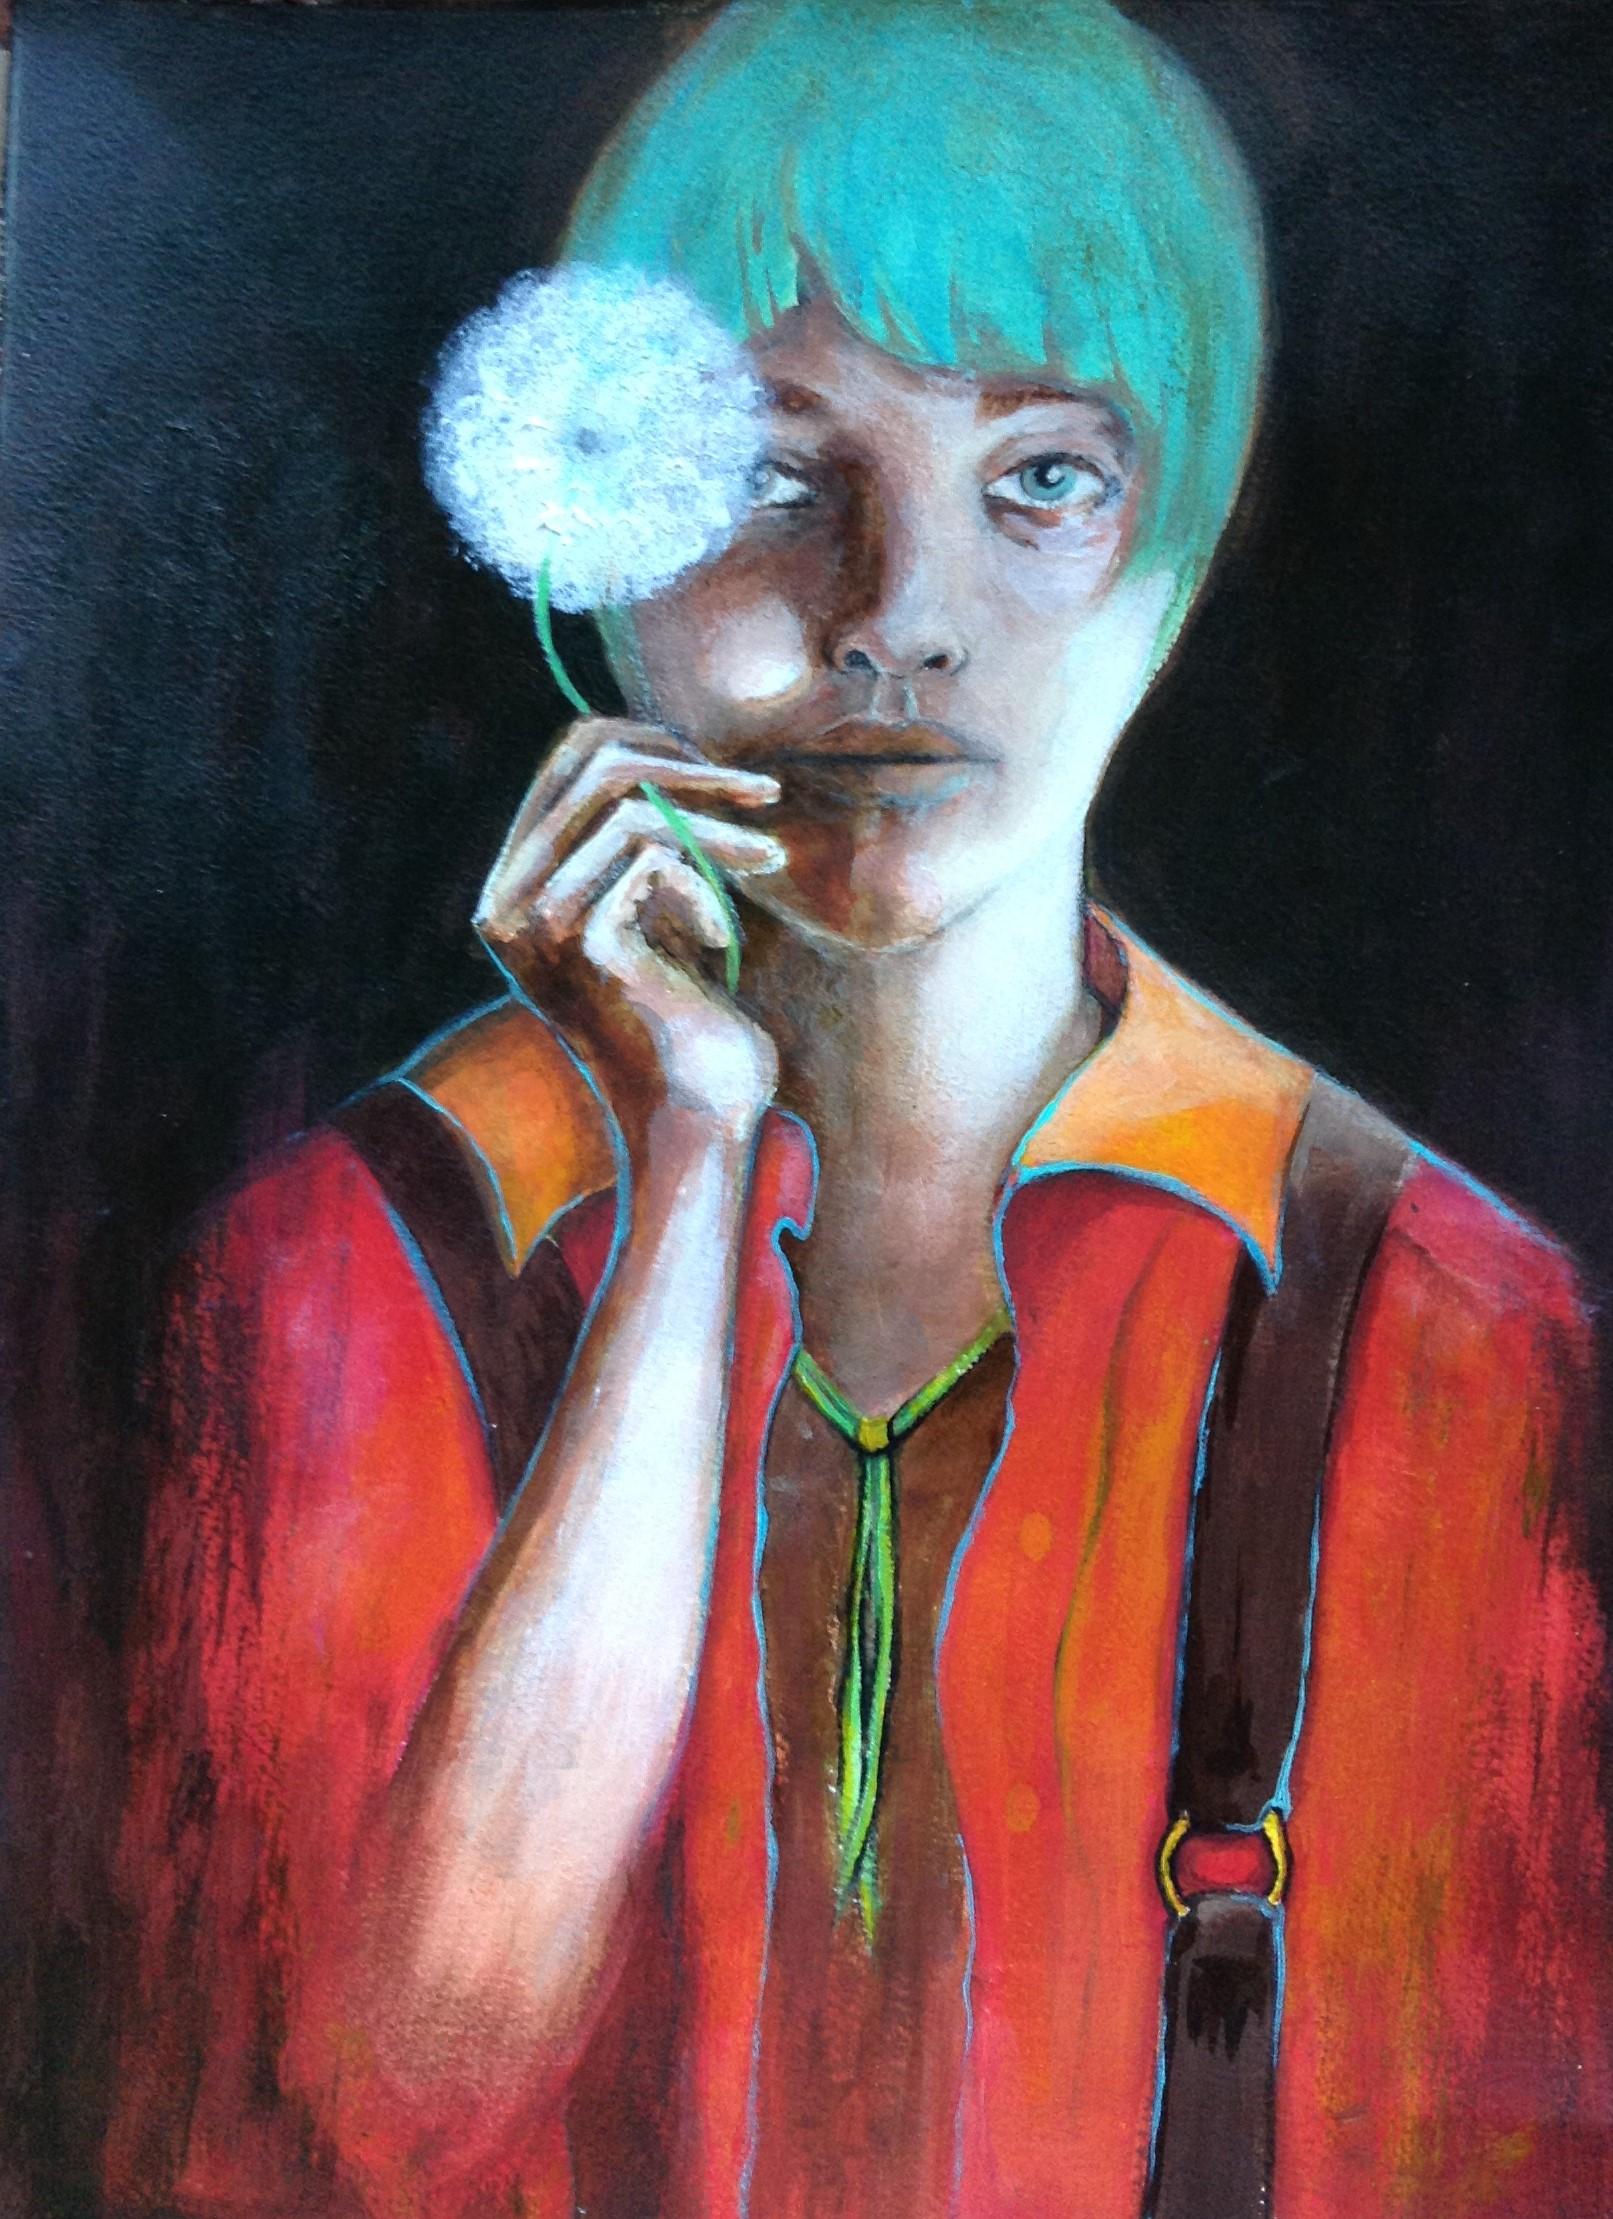 """I See My Dream"" - Suspender Girl"